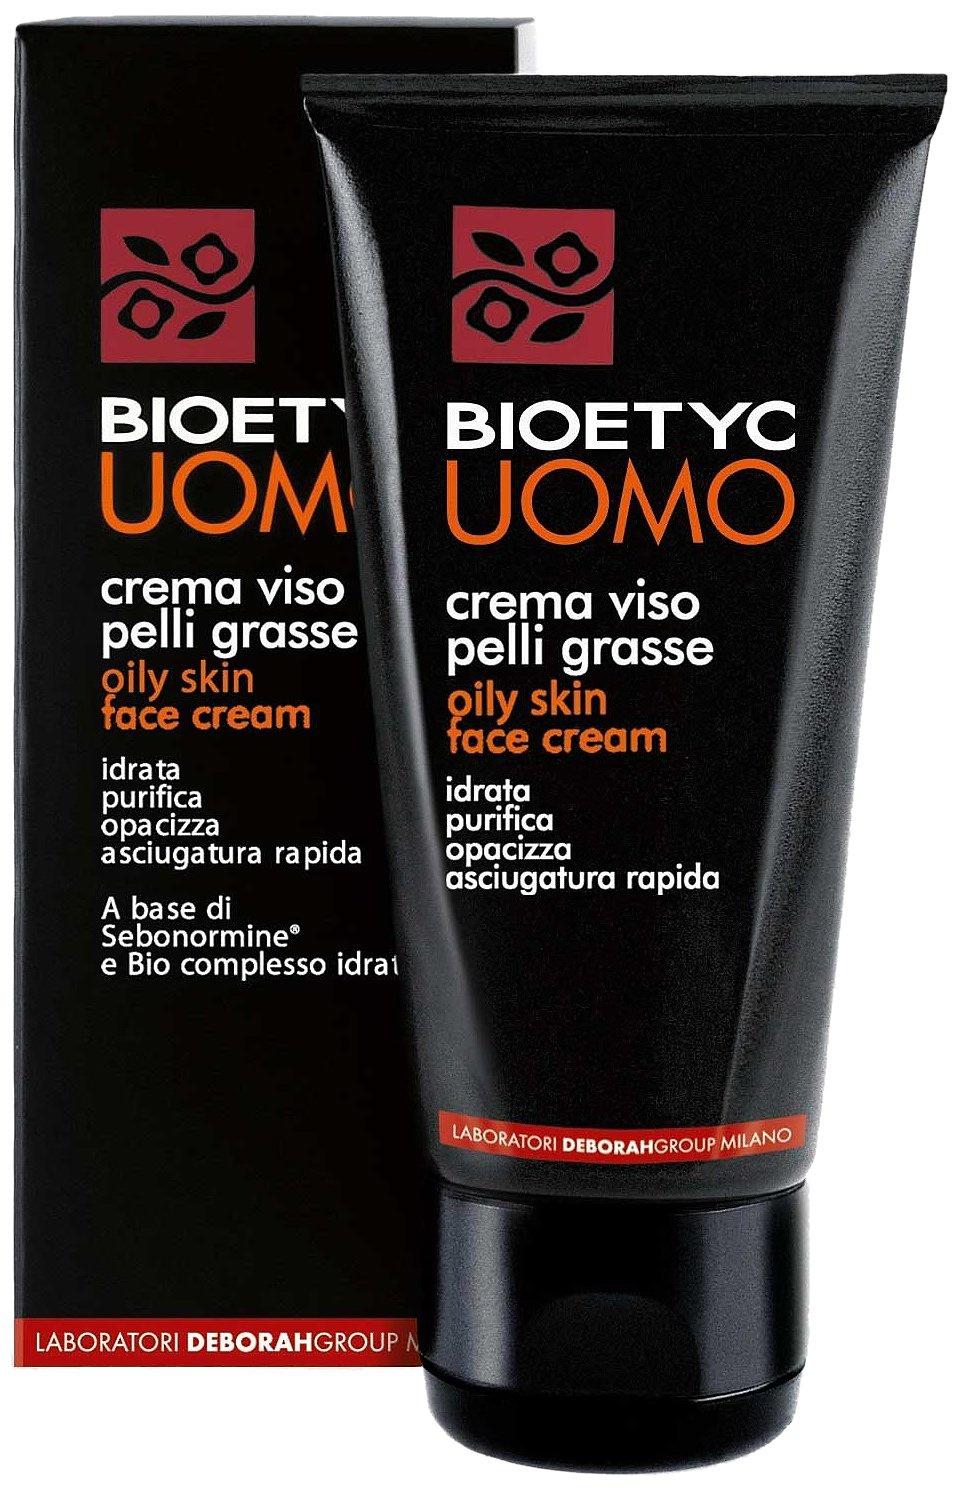 Bioetyc UOMO Mattifying Face Cream